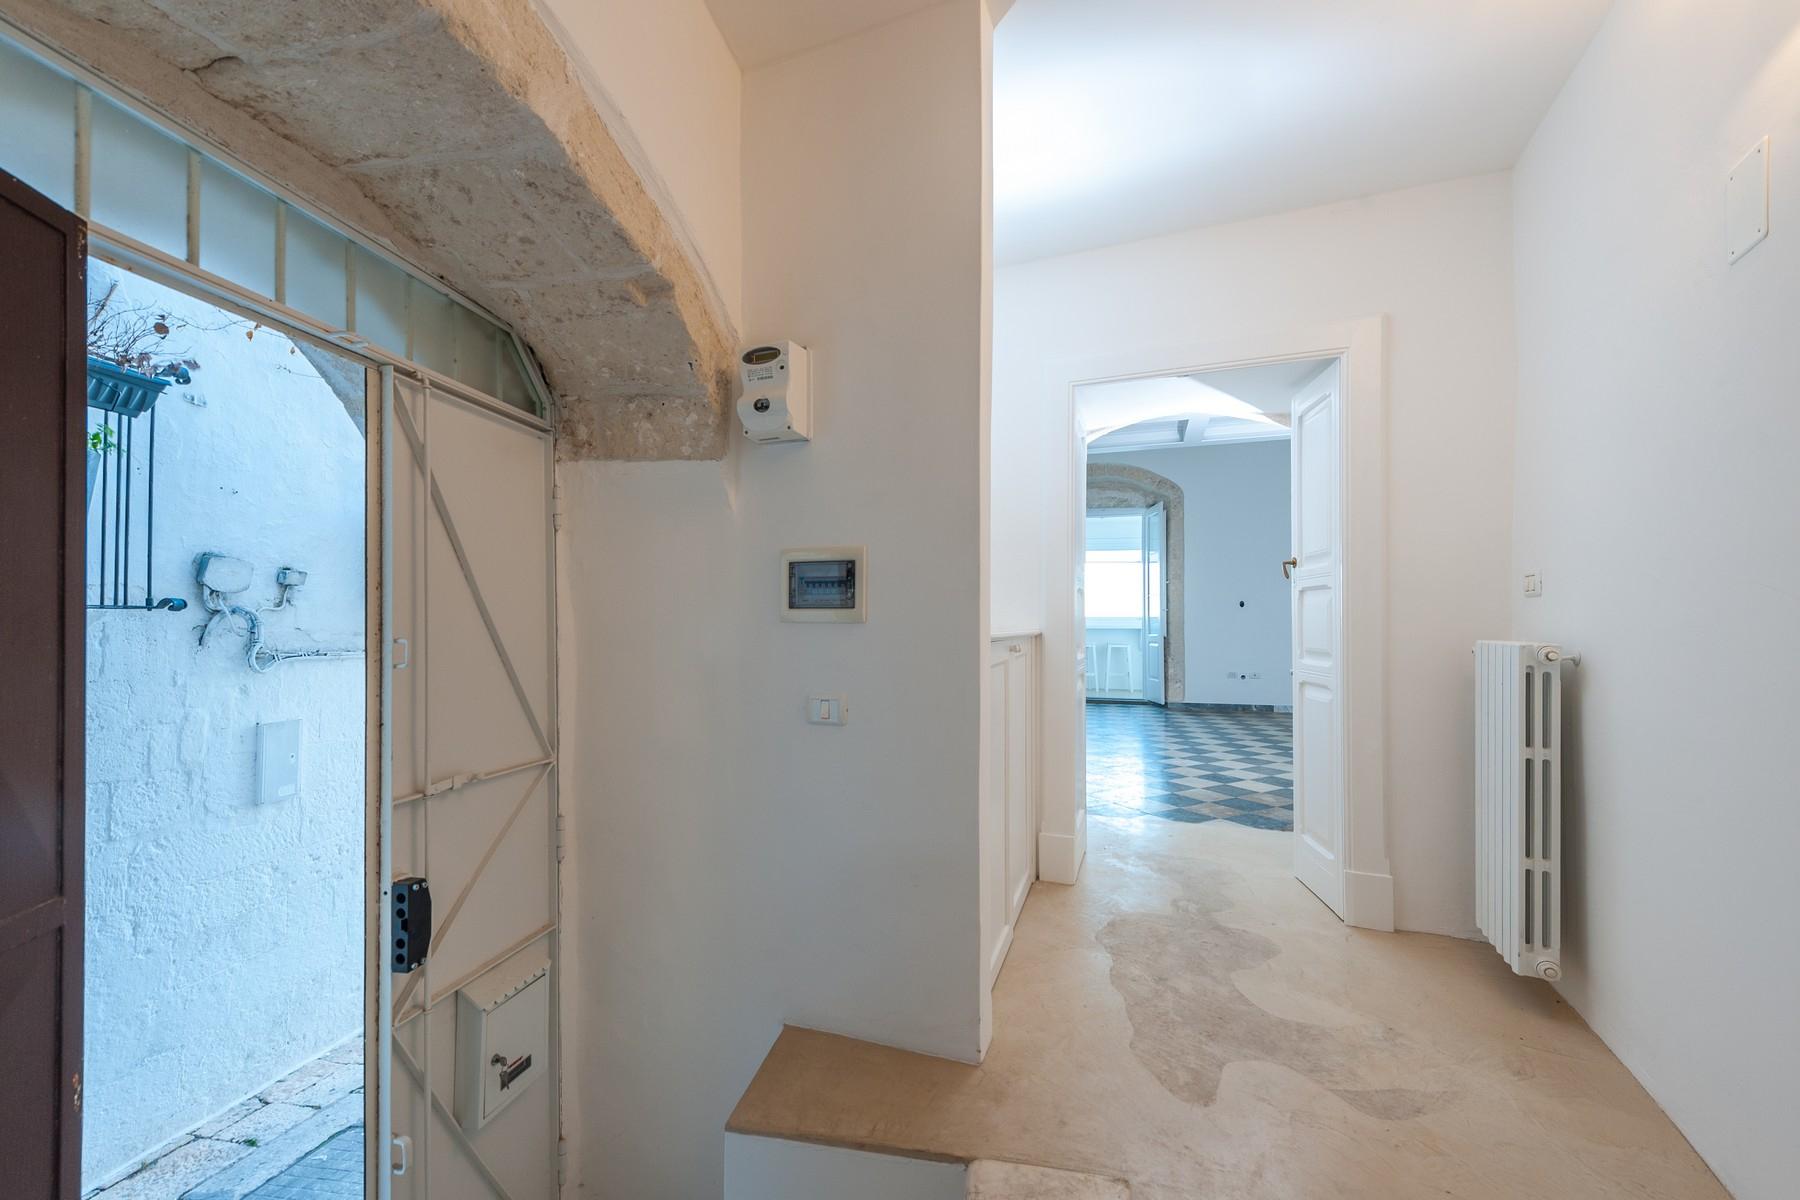 Appartamento in Vendita a Ostuni: 5 locali, 265 mq - Foto 28